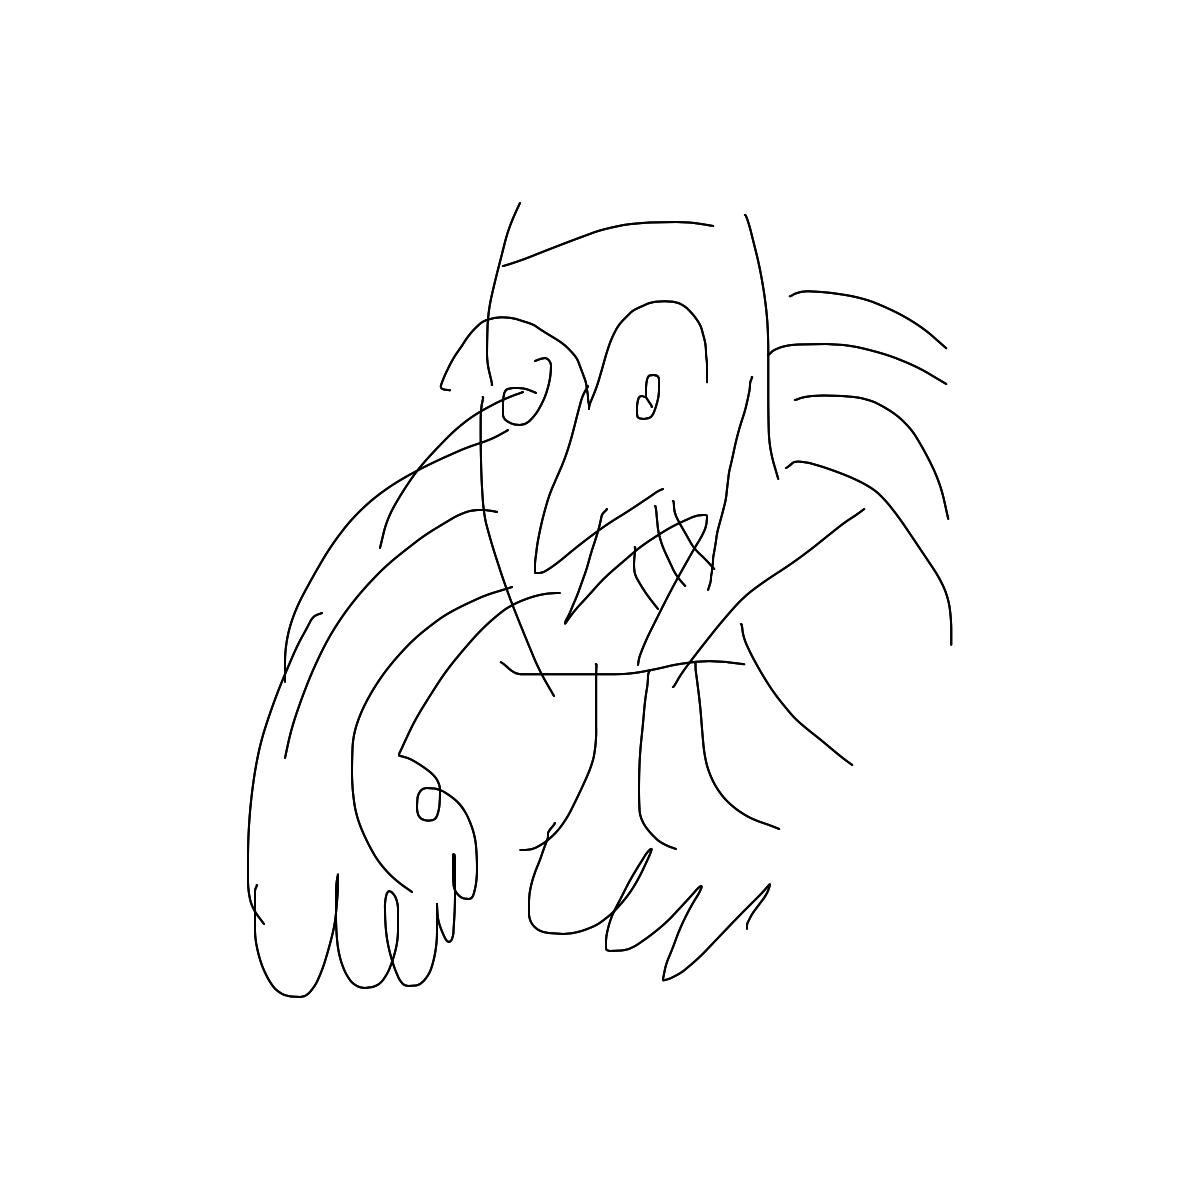 BAAAM drawing#20790 lat:43.2952995300293000lng: 5.3739590644836430